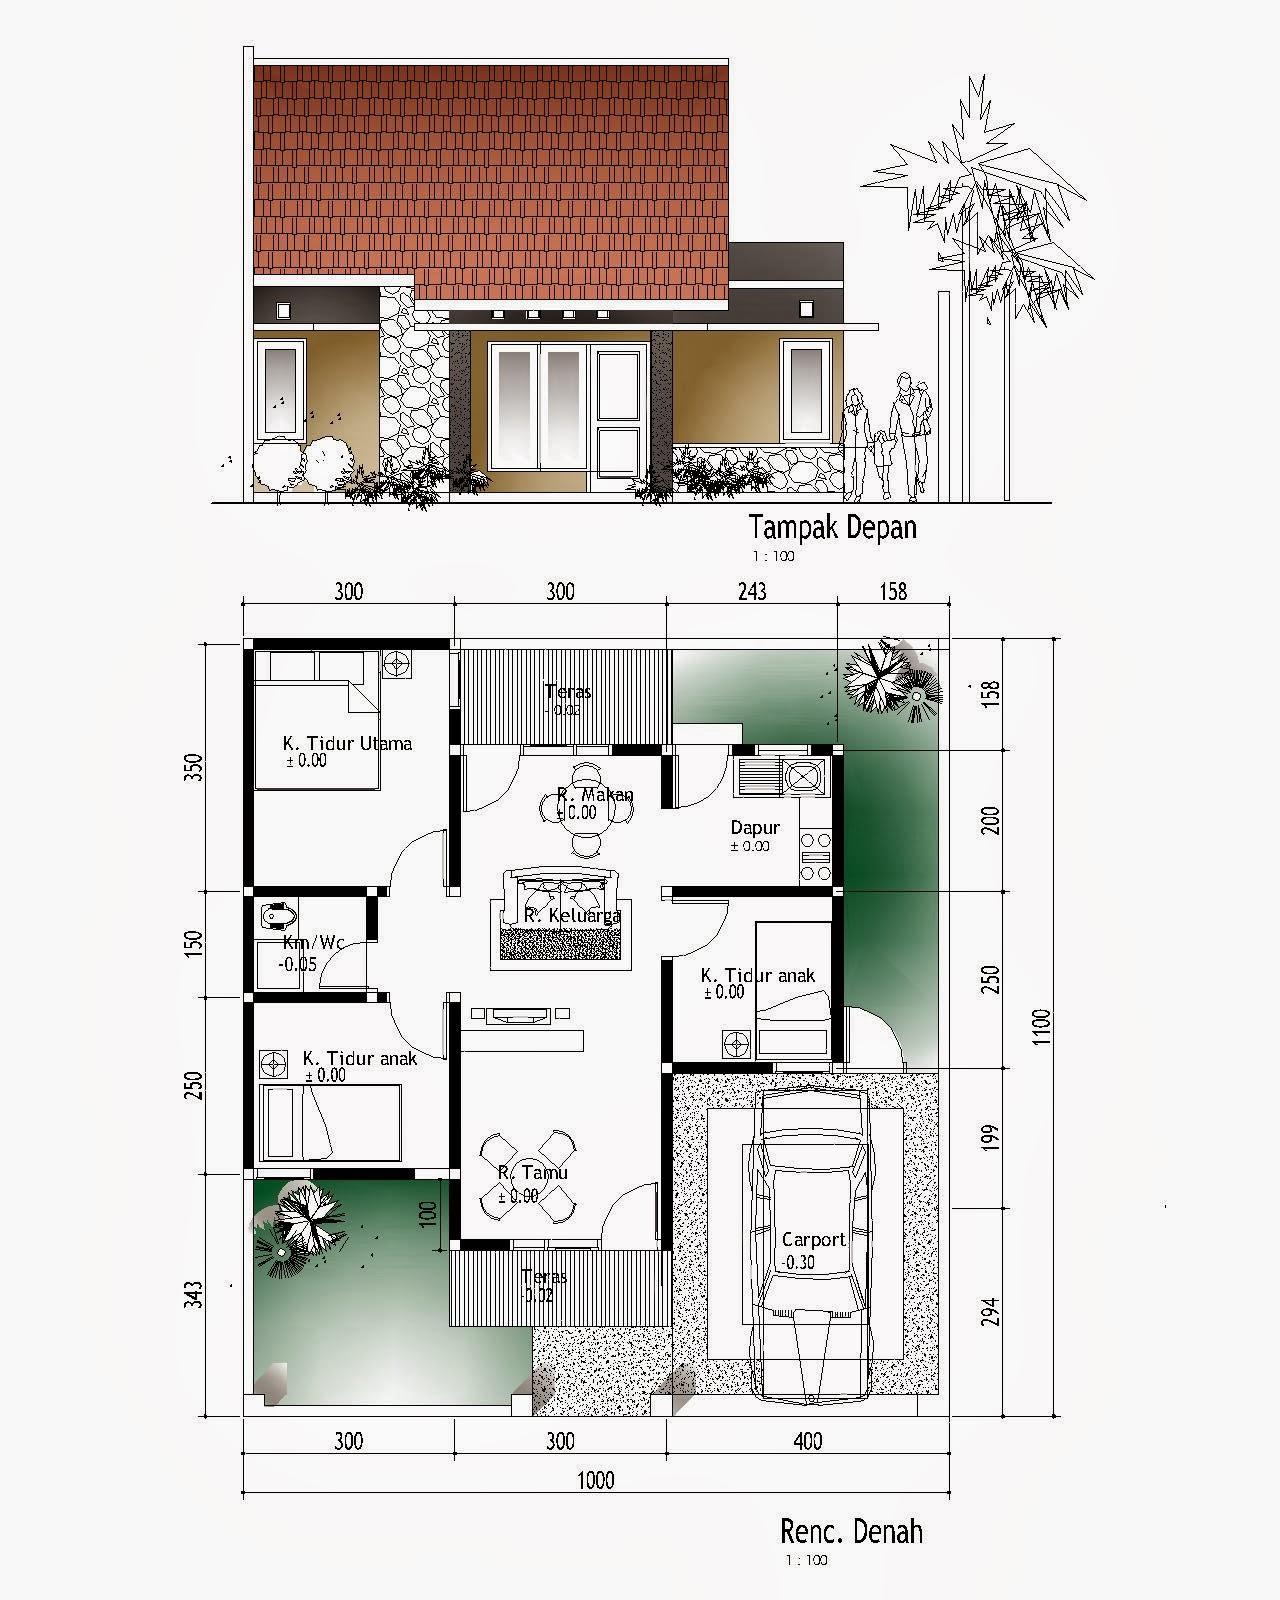 gambar rumah dan property idaman paling lengkap dan terbaru